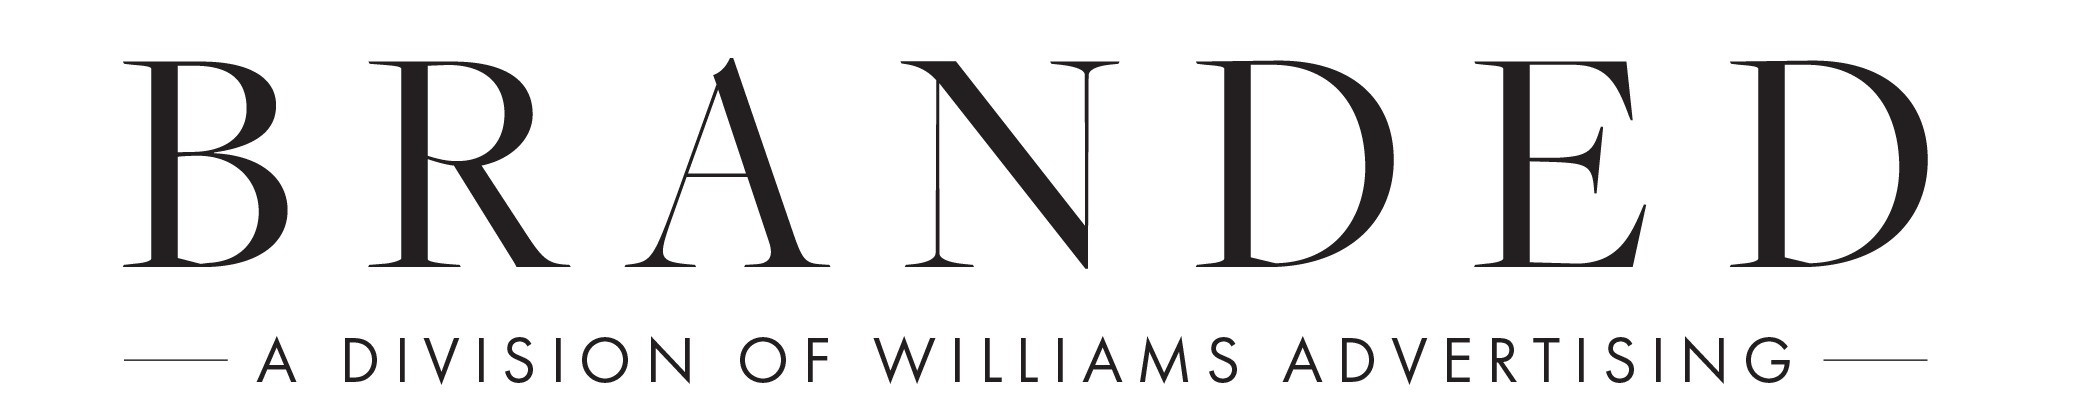 Branded Merchandise Williams Advertising